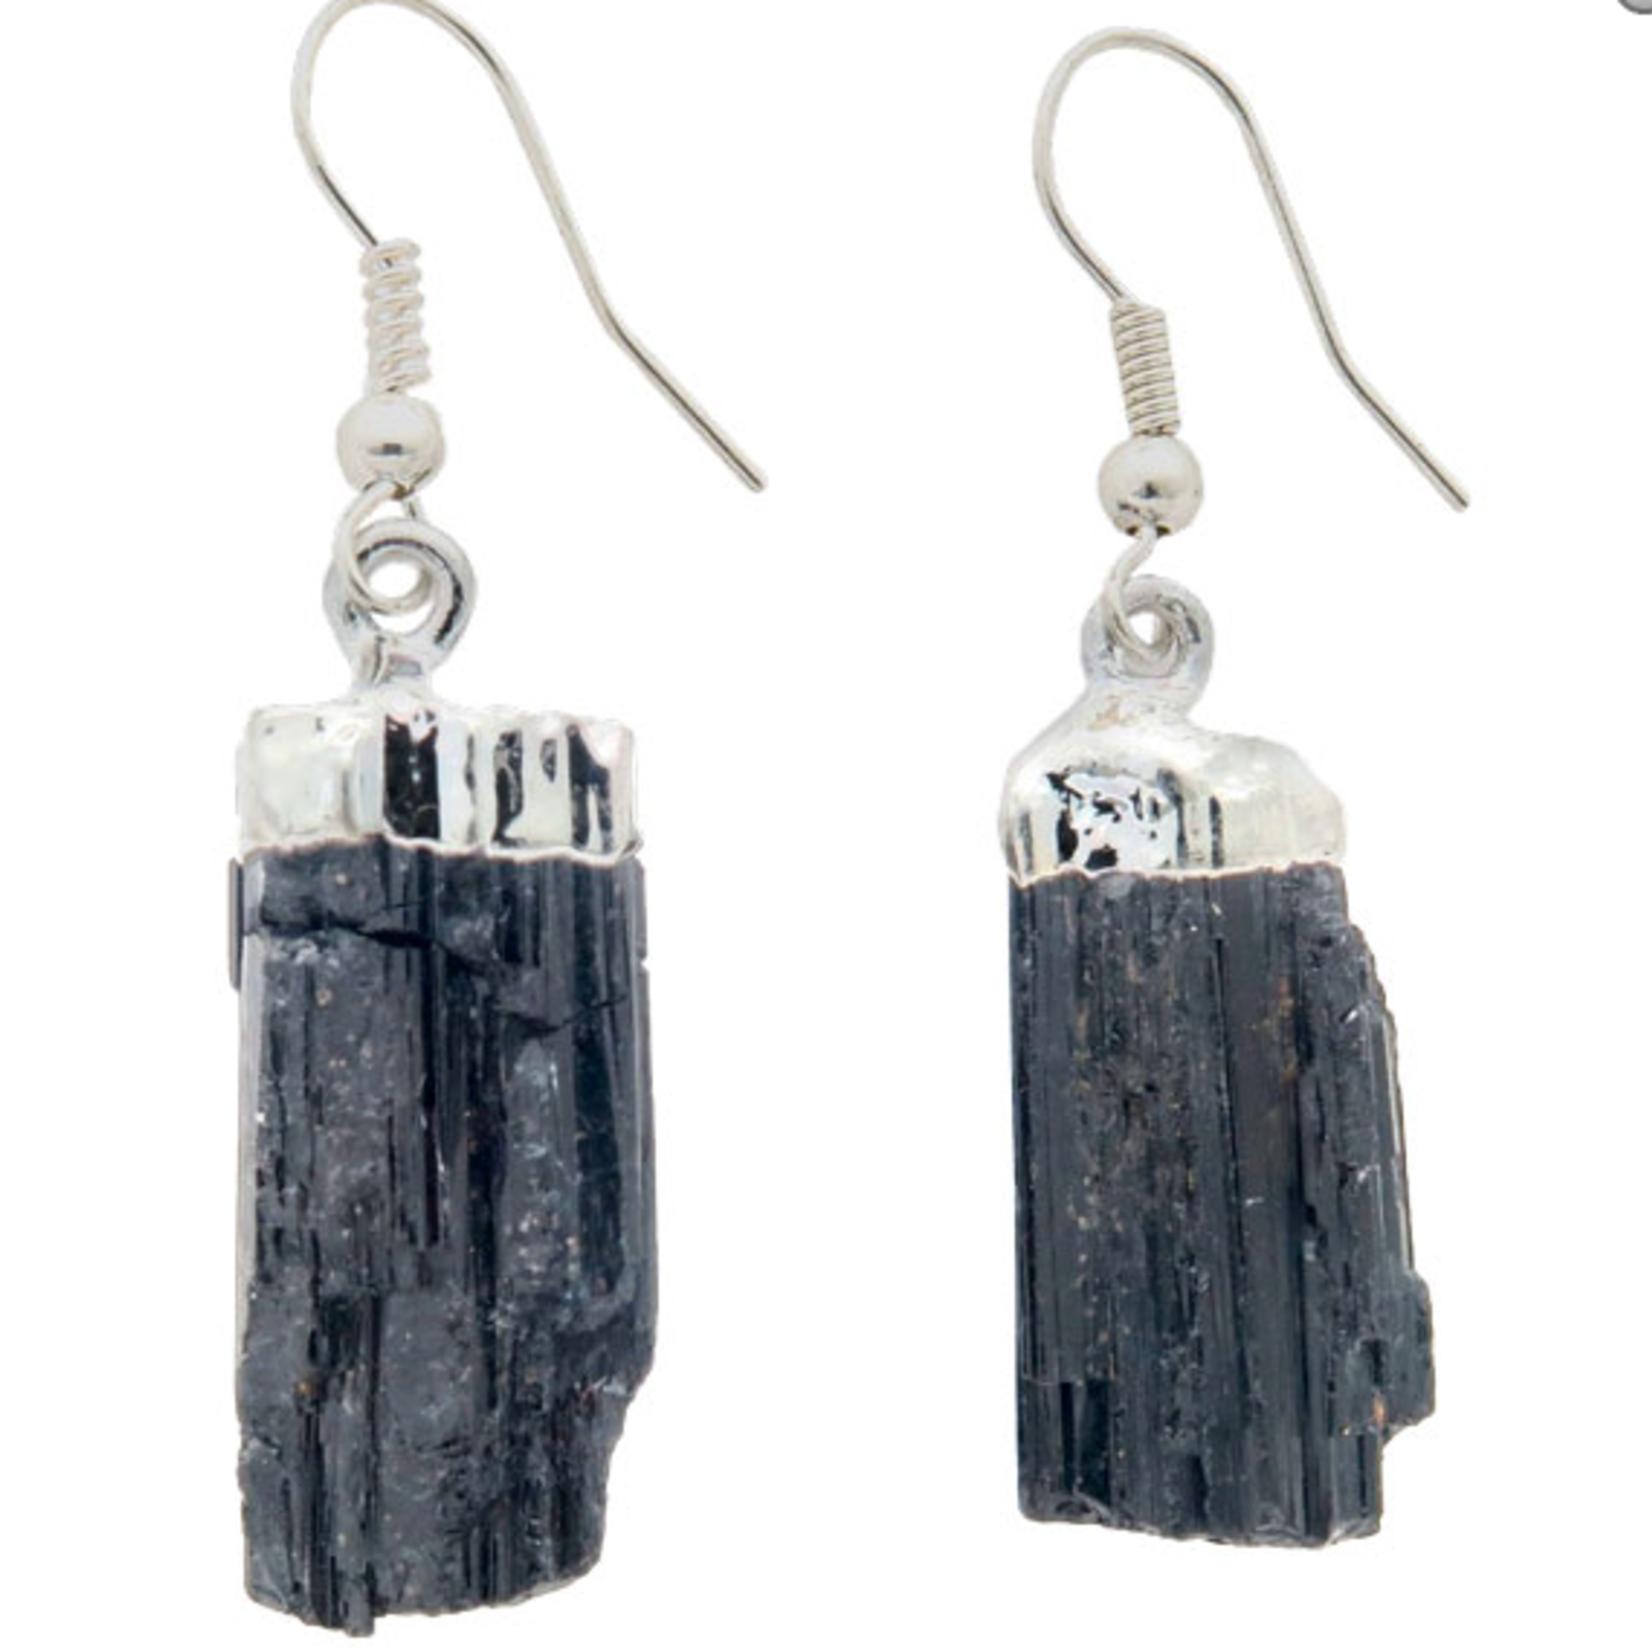 Earrings Mineral Rough Black Tourmaline